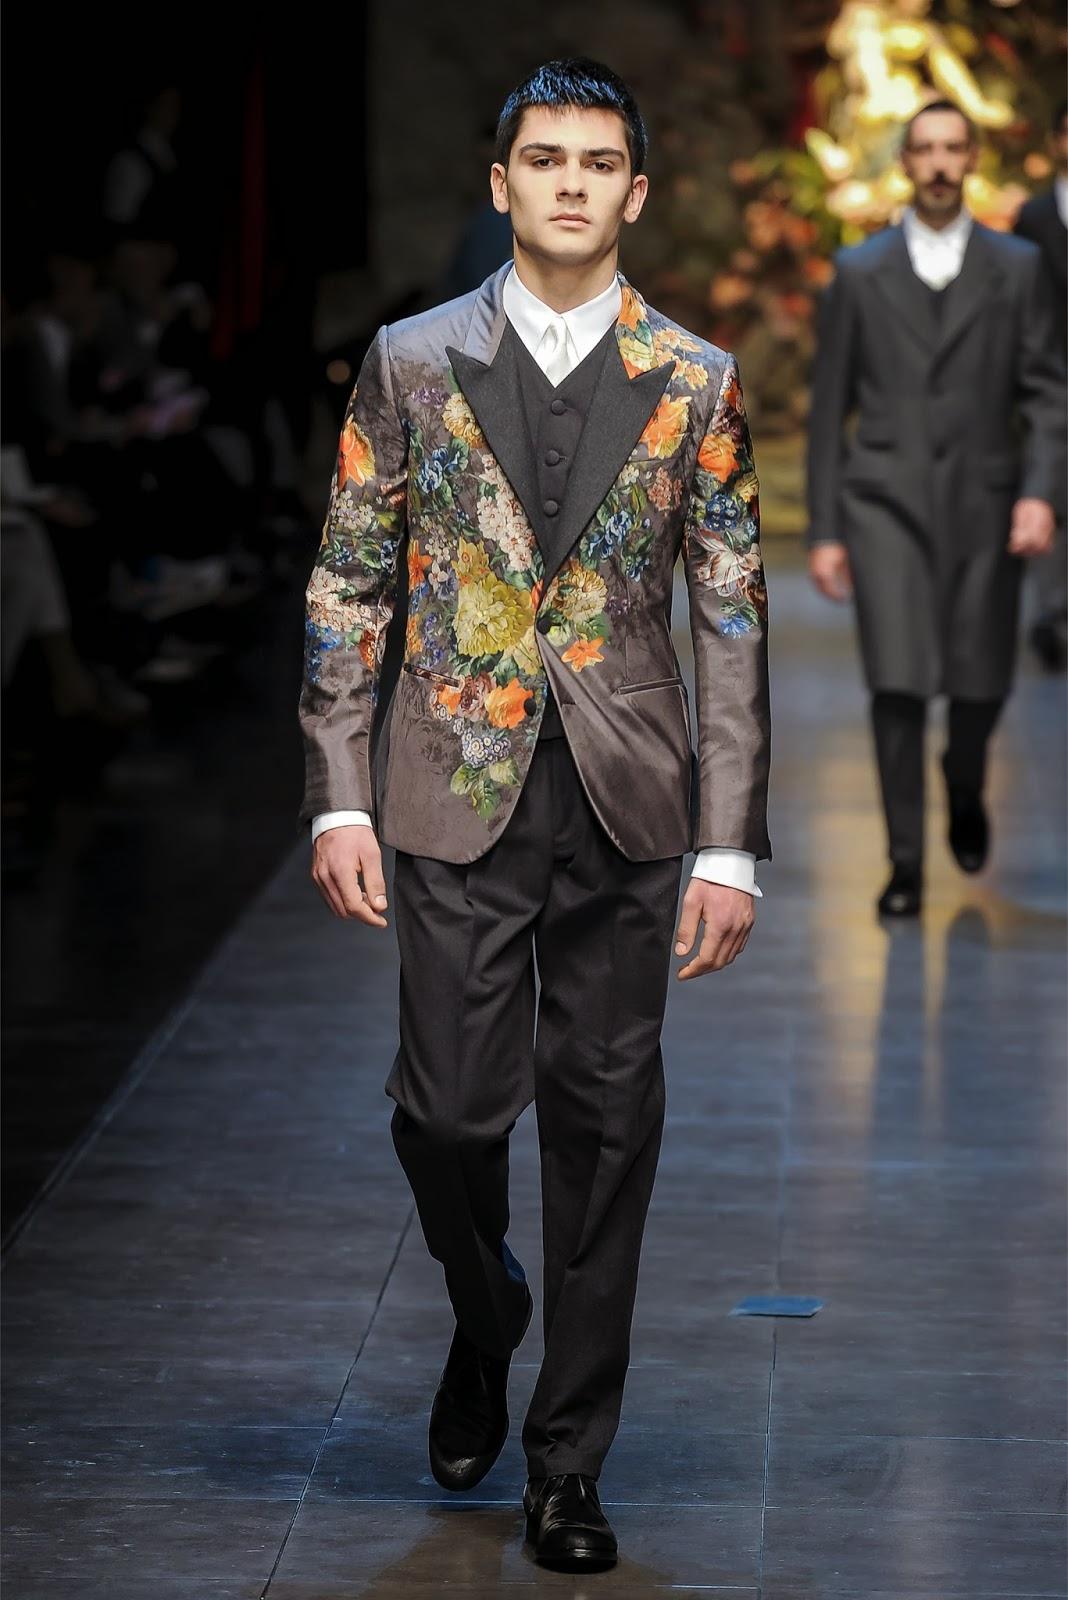 Adi Surantha In Fashion Fashion Week Report Fall Winter 20013 2014